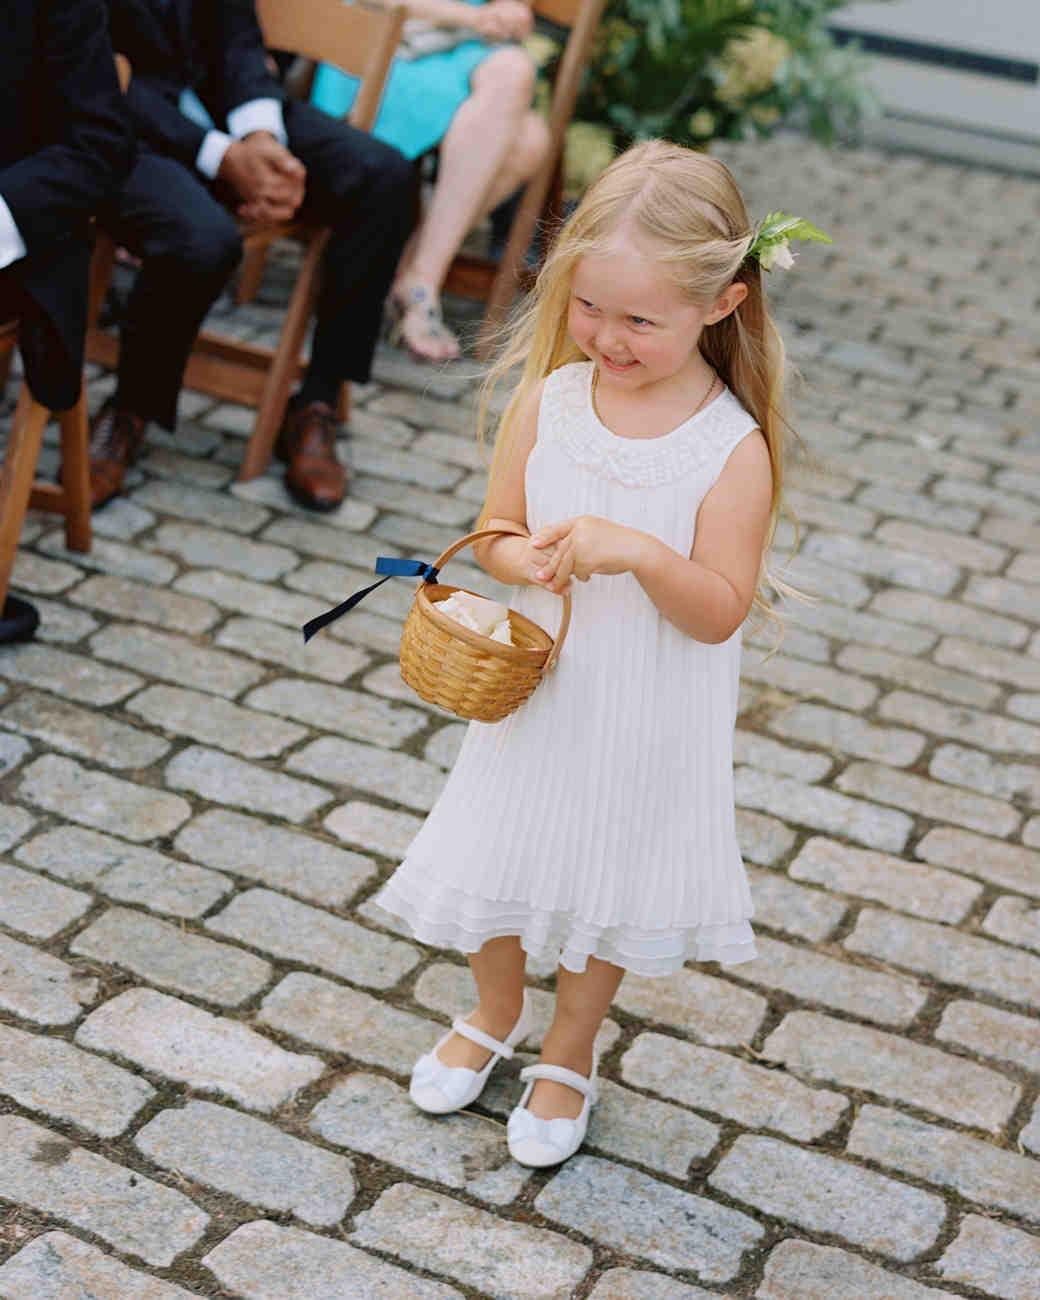 kristina-barrett-wedding-martha-farm-cl11c08-r01-010-d112491.jpg